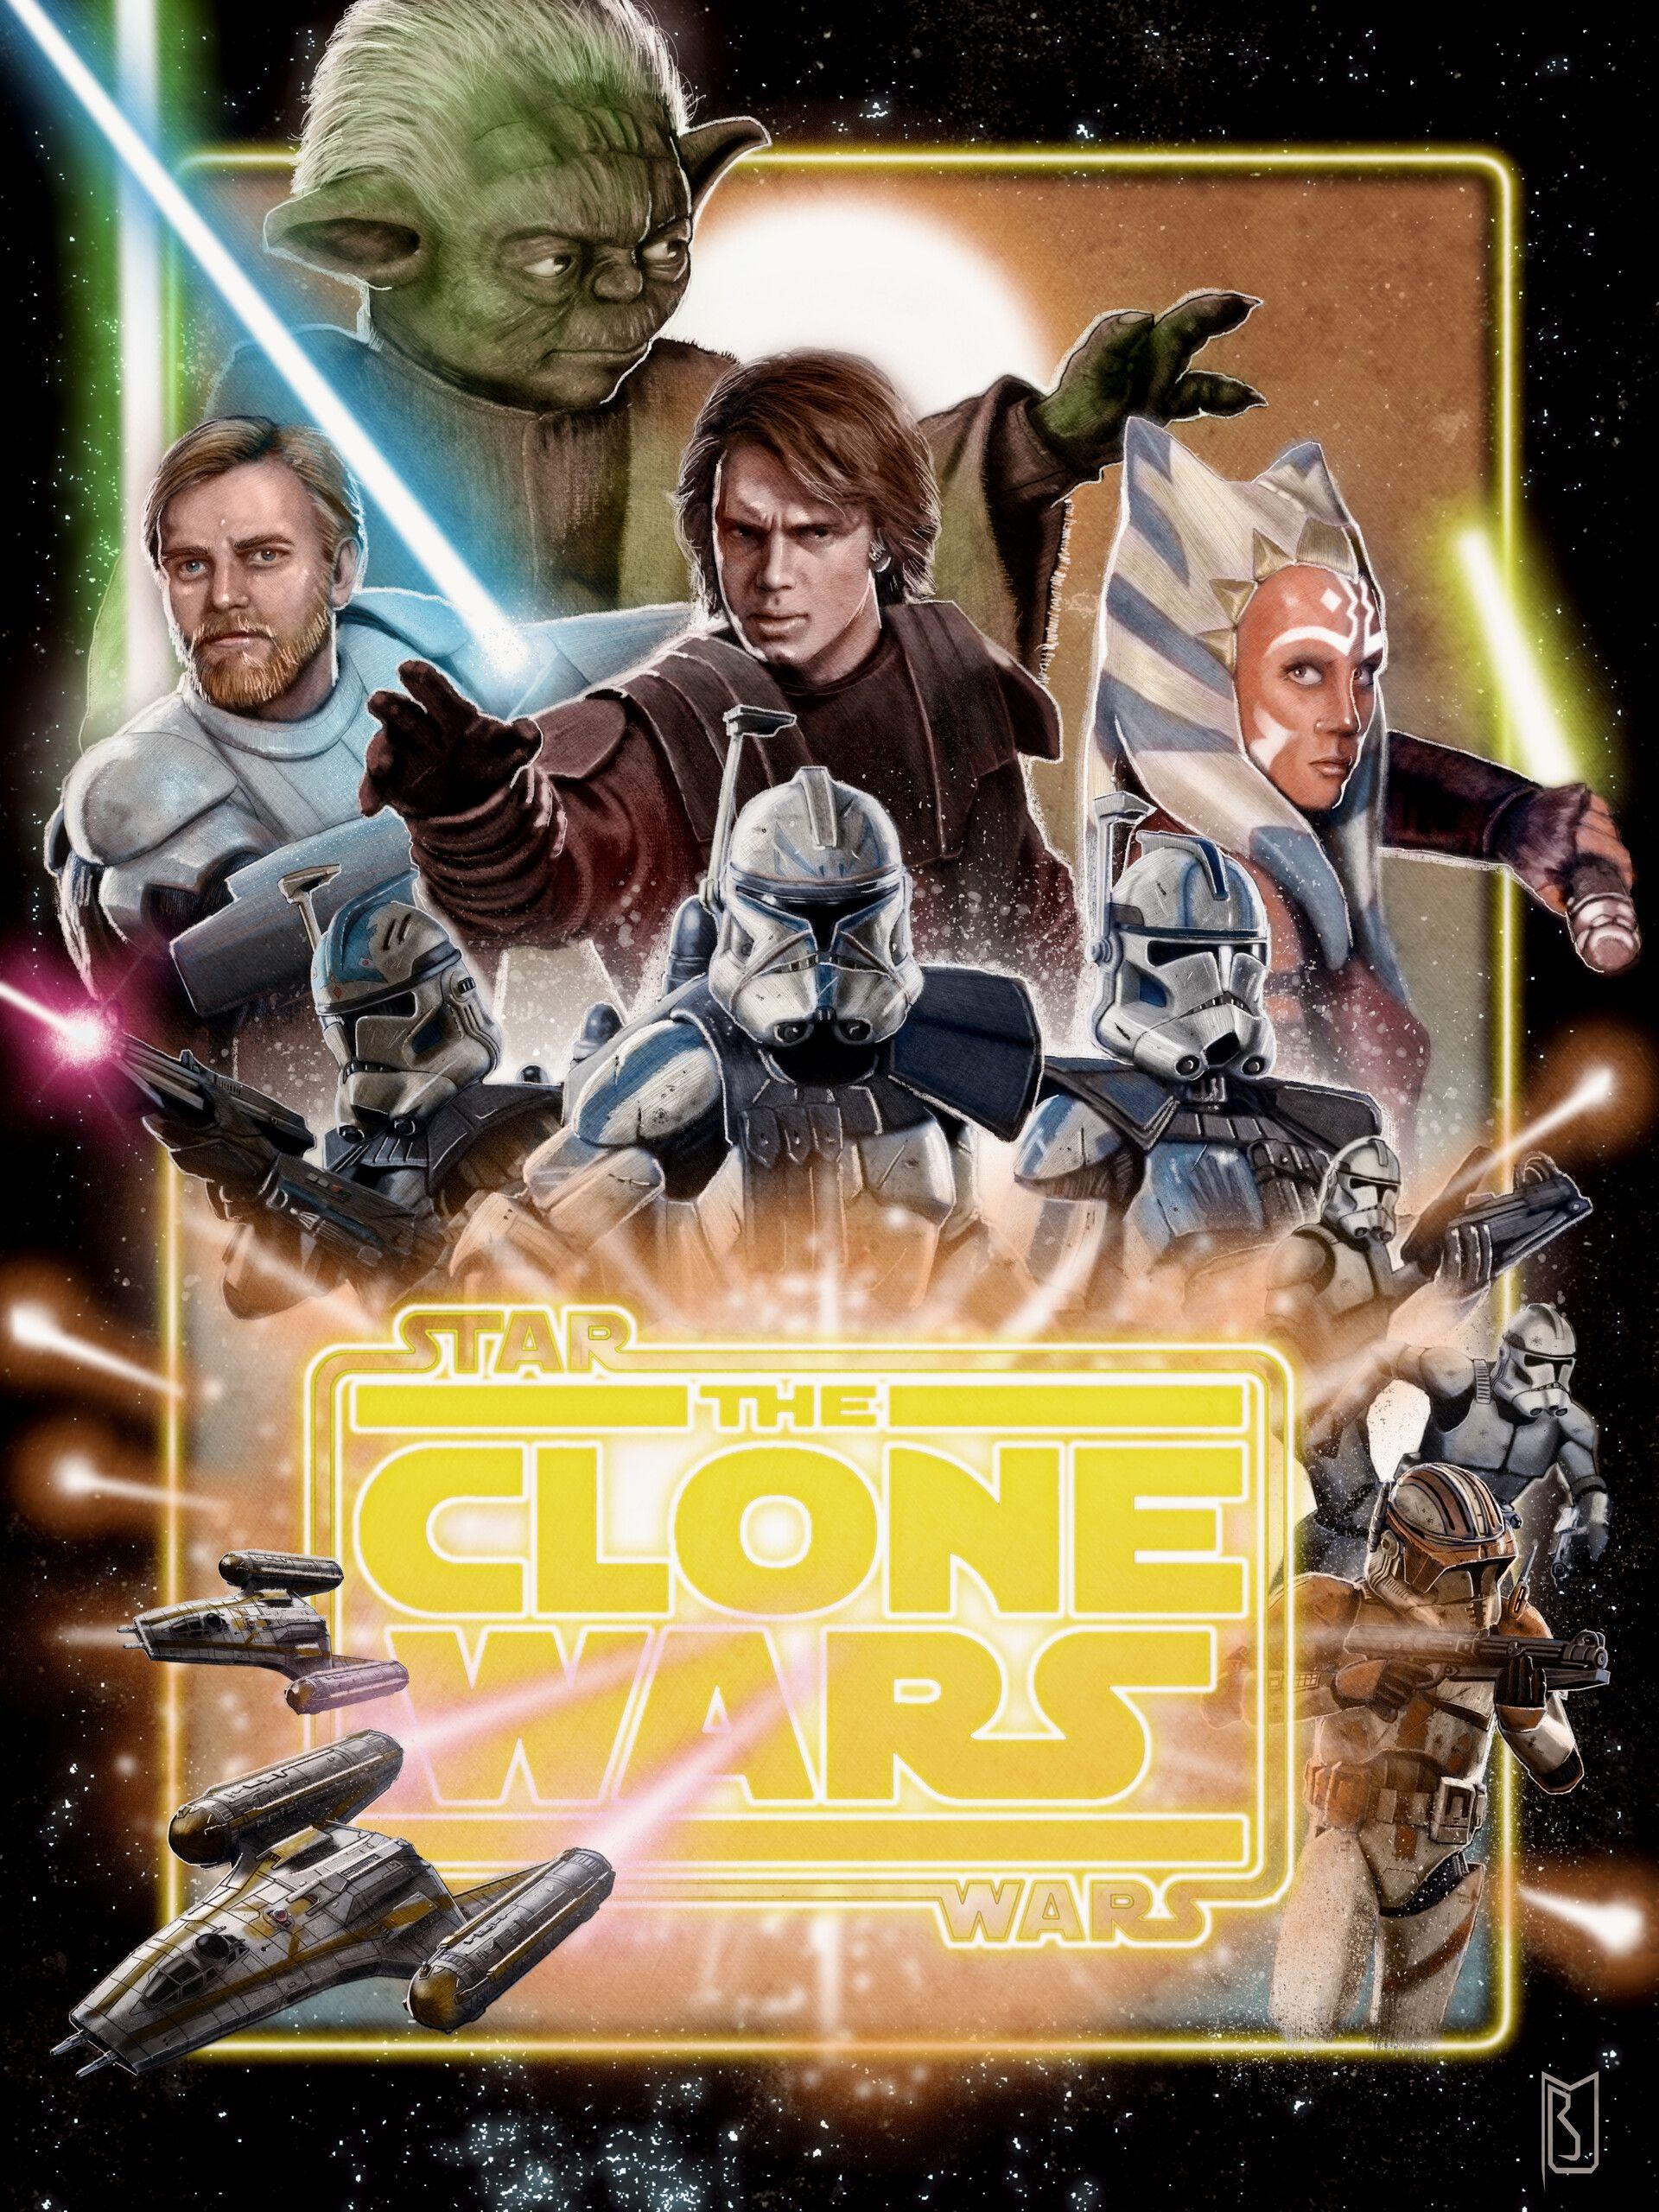 Micah Brown Clone Wars Heroes Star Wars Star Wars Books Star Wars Ahsoka